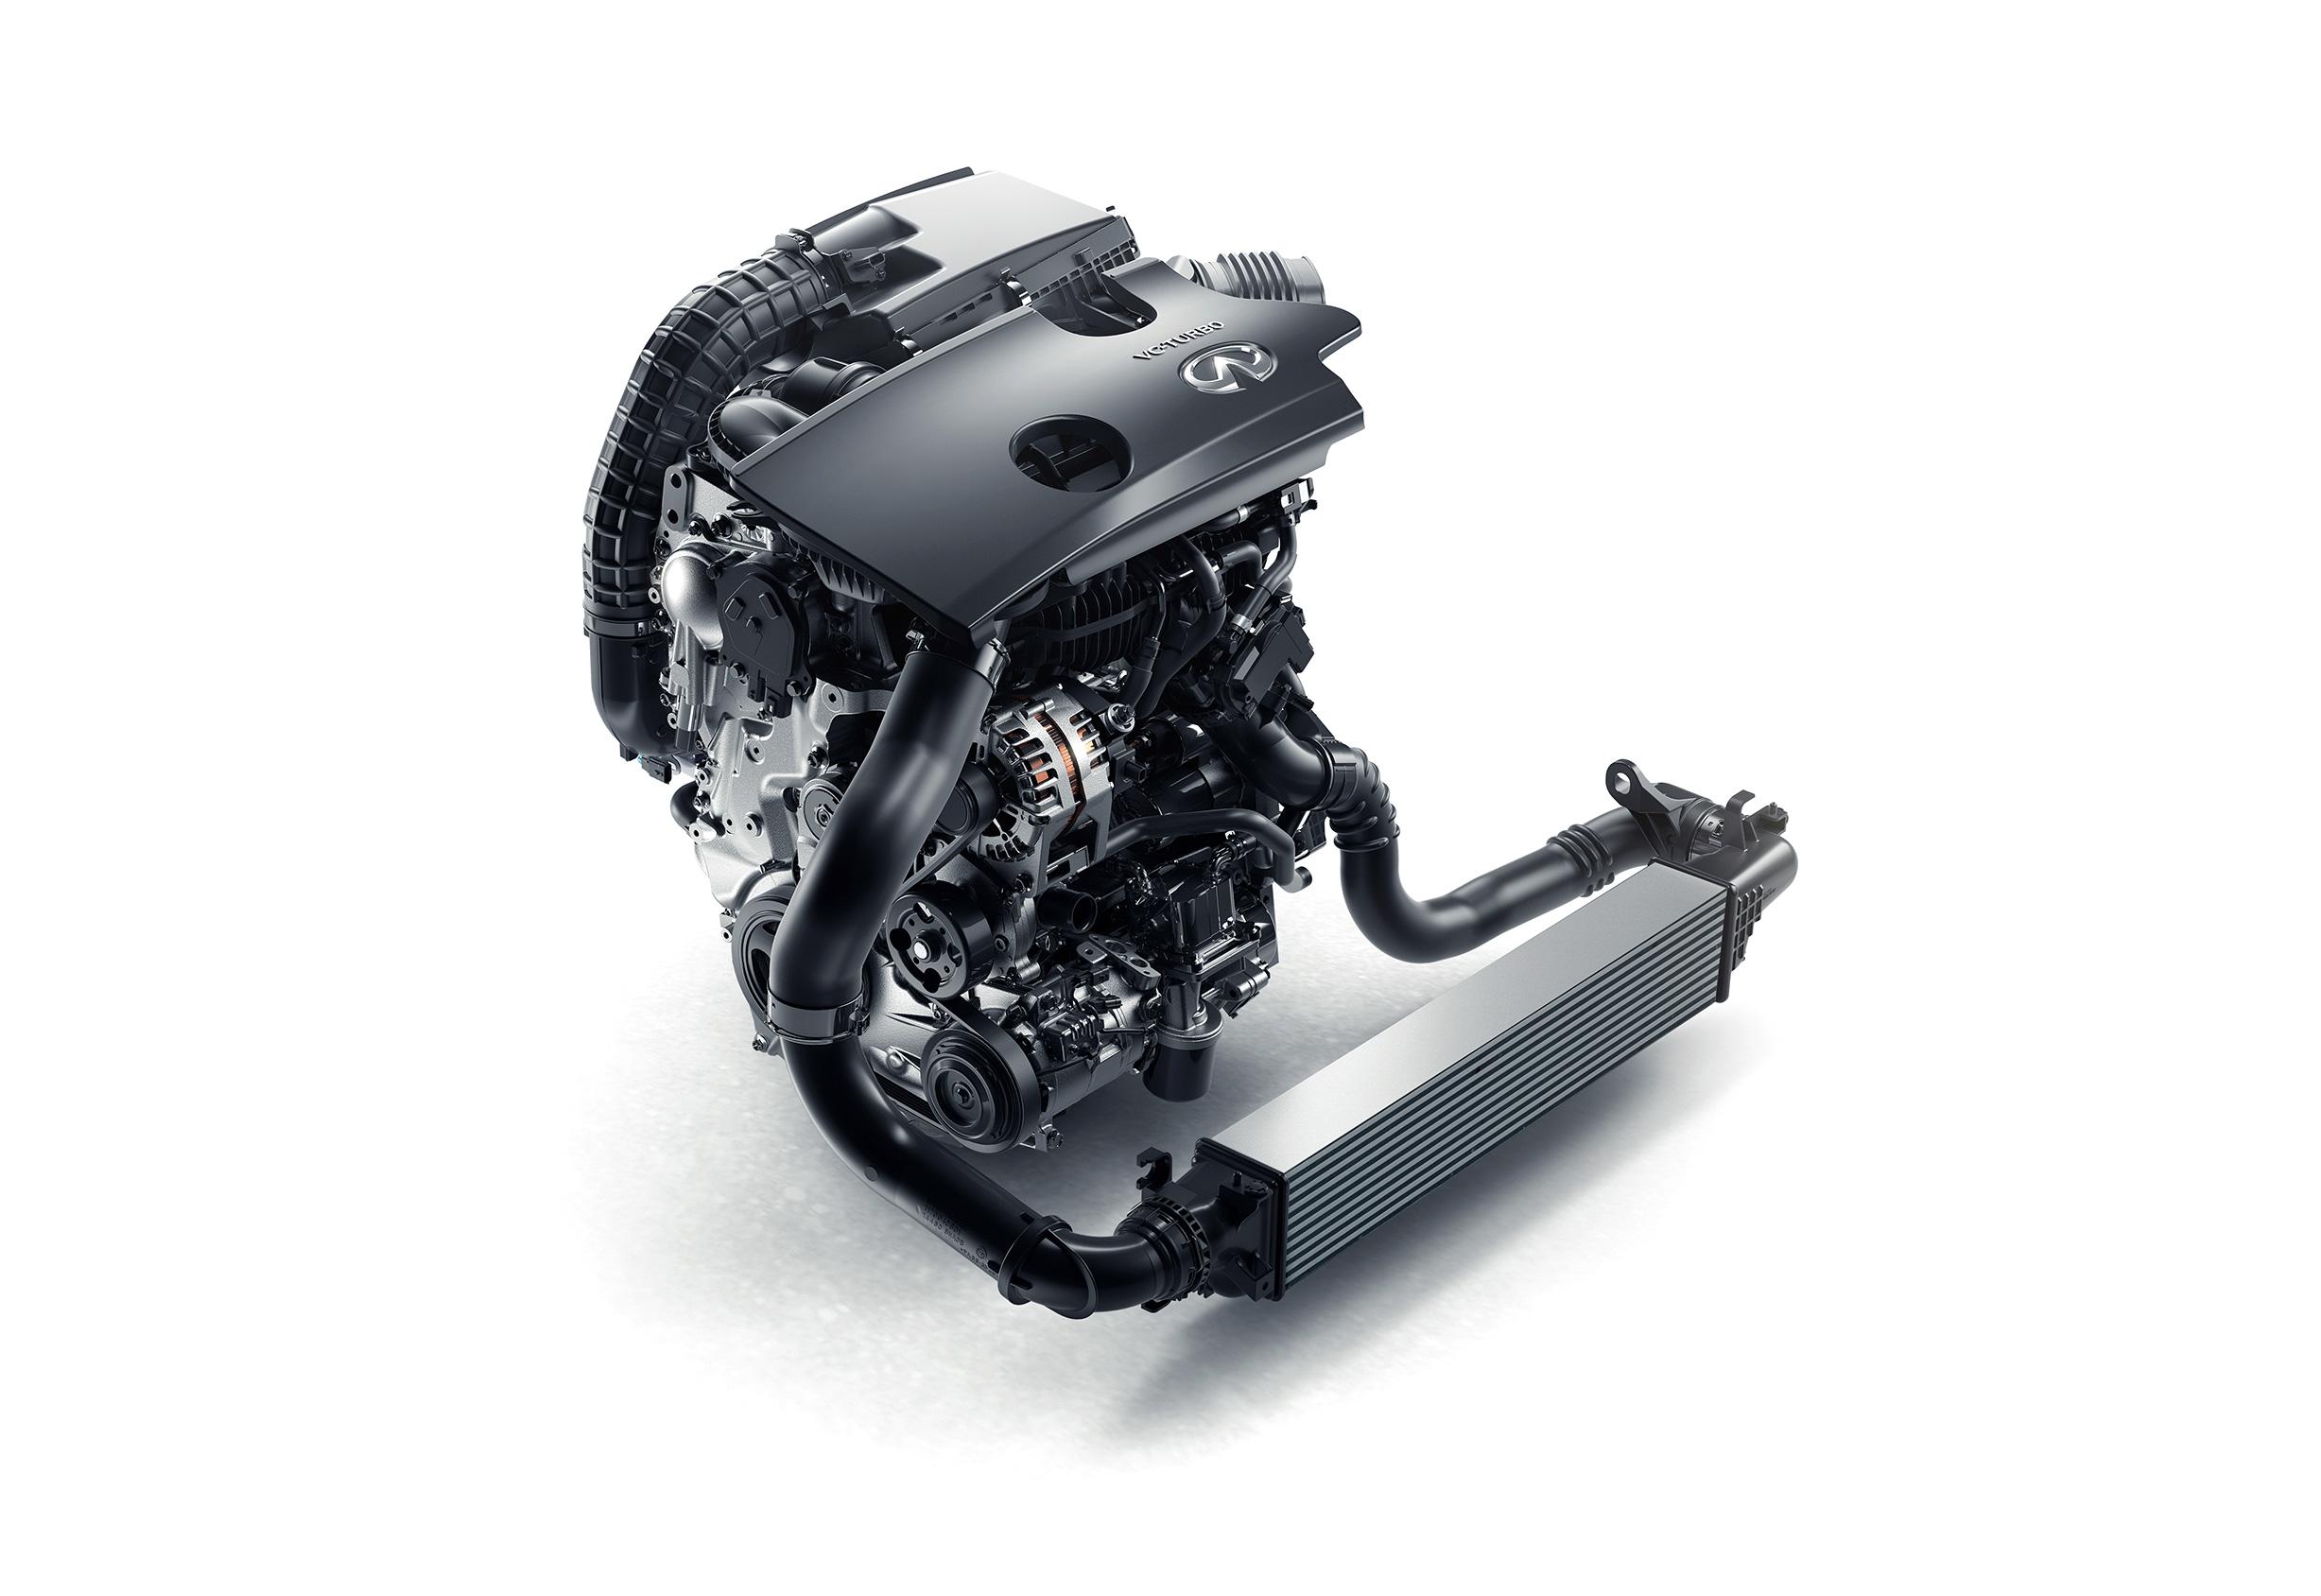 INFINITI-VC-T-engine---14-August-2016---F3-42k.jpg